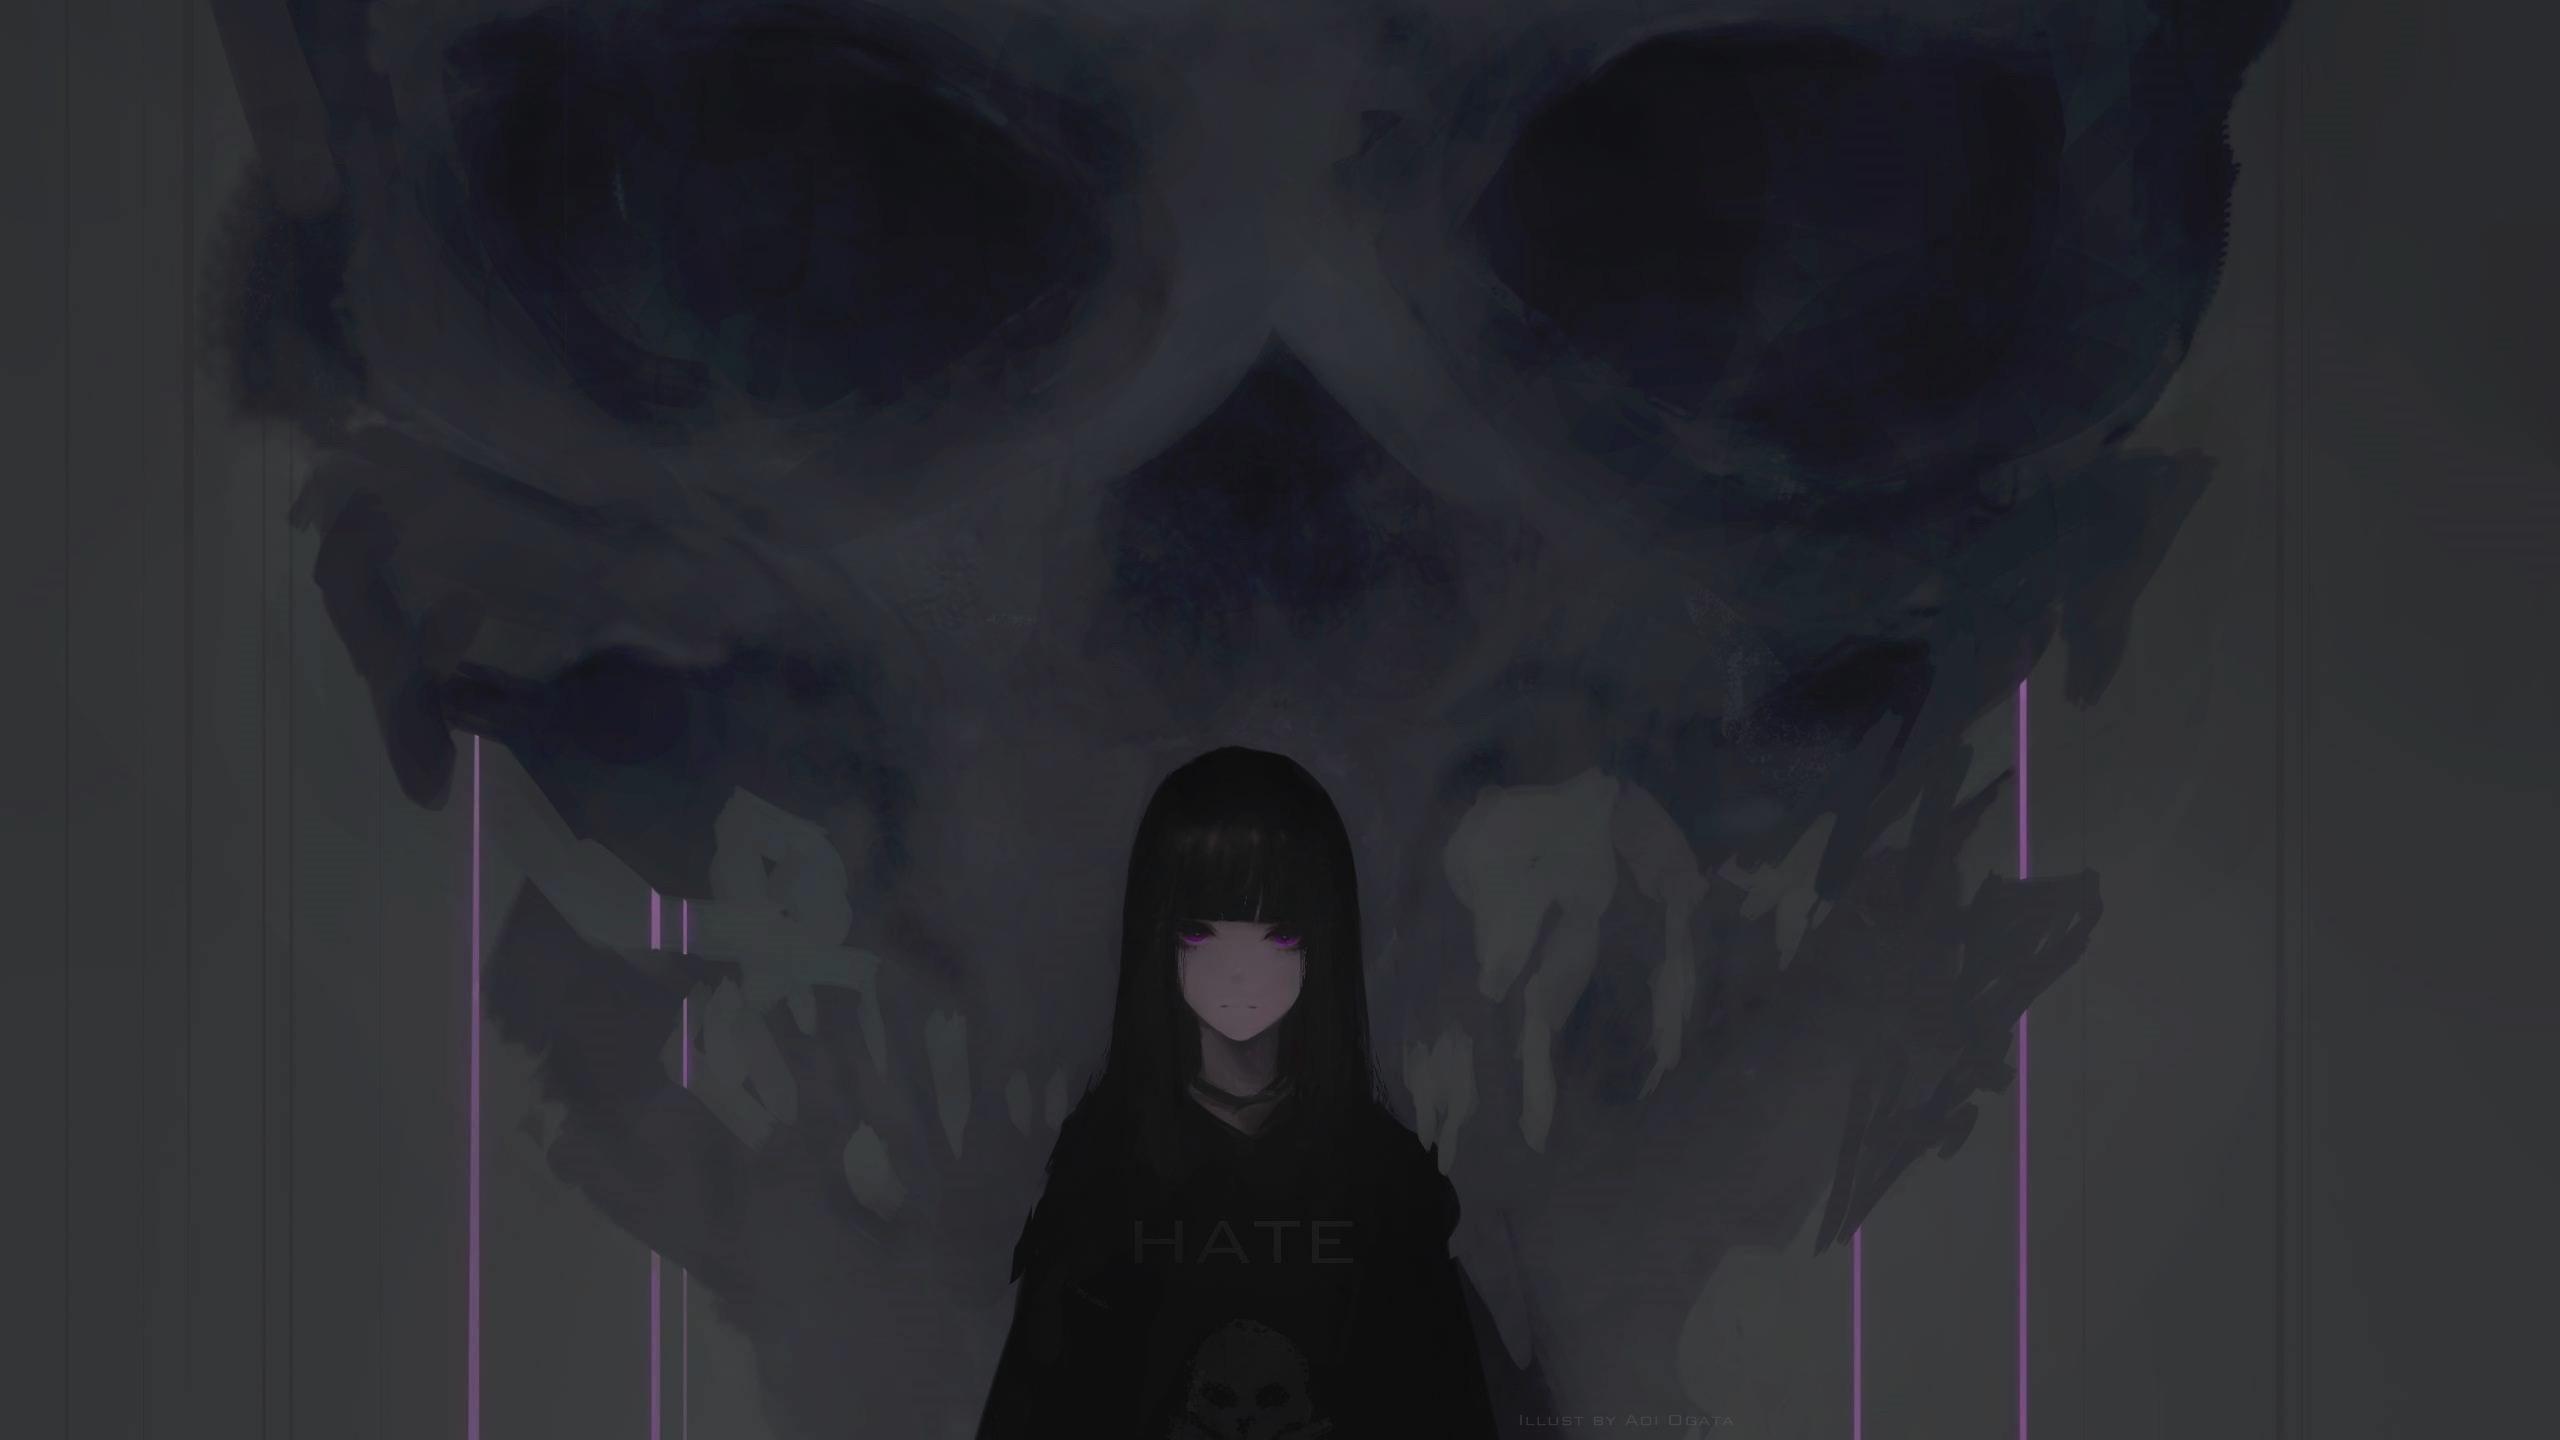 Download 2560x1440 Wallpaper Anime Girl Purple Eyes Dark Skull Dual Wide Widescreen 16 9 Widescreen 2560x1440 Hd Image Background 2429